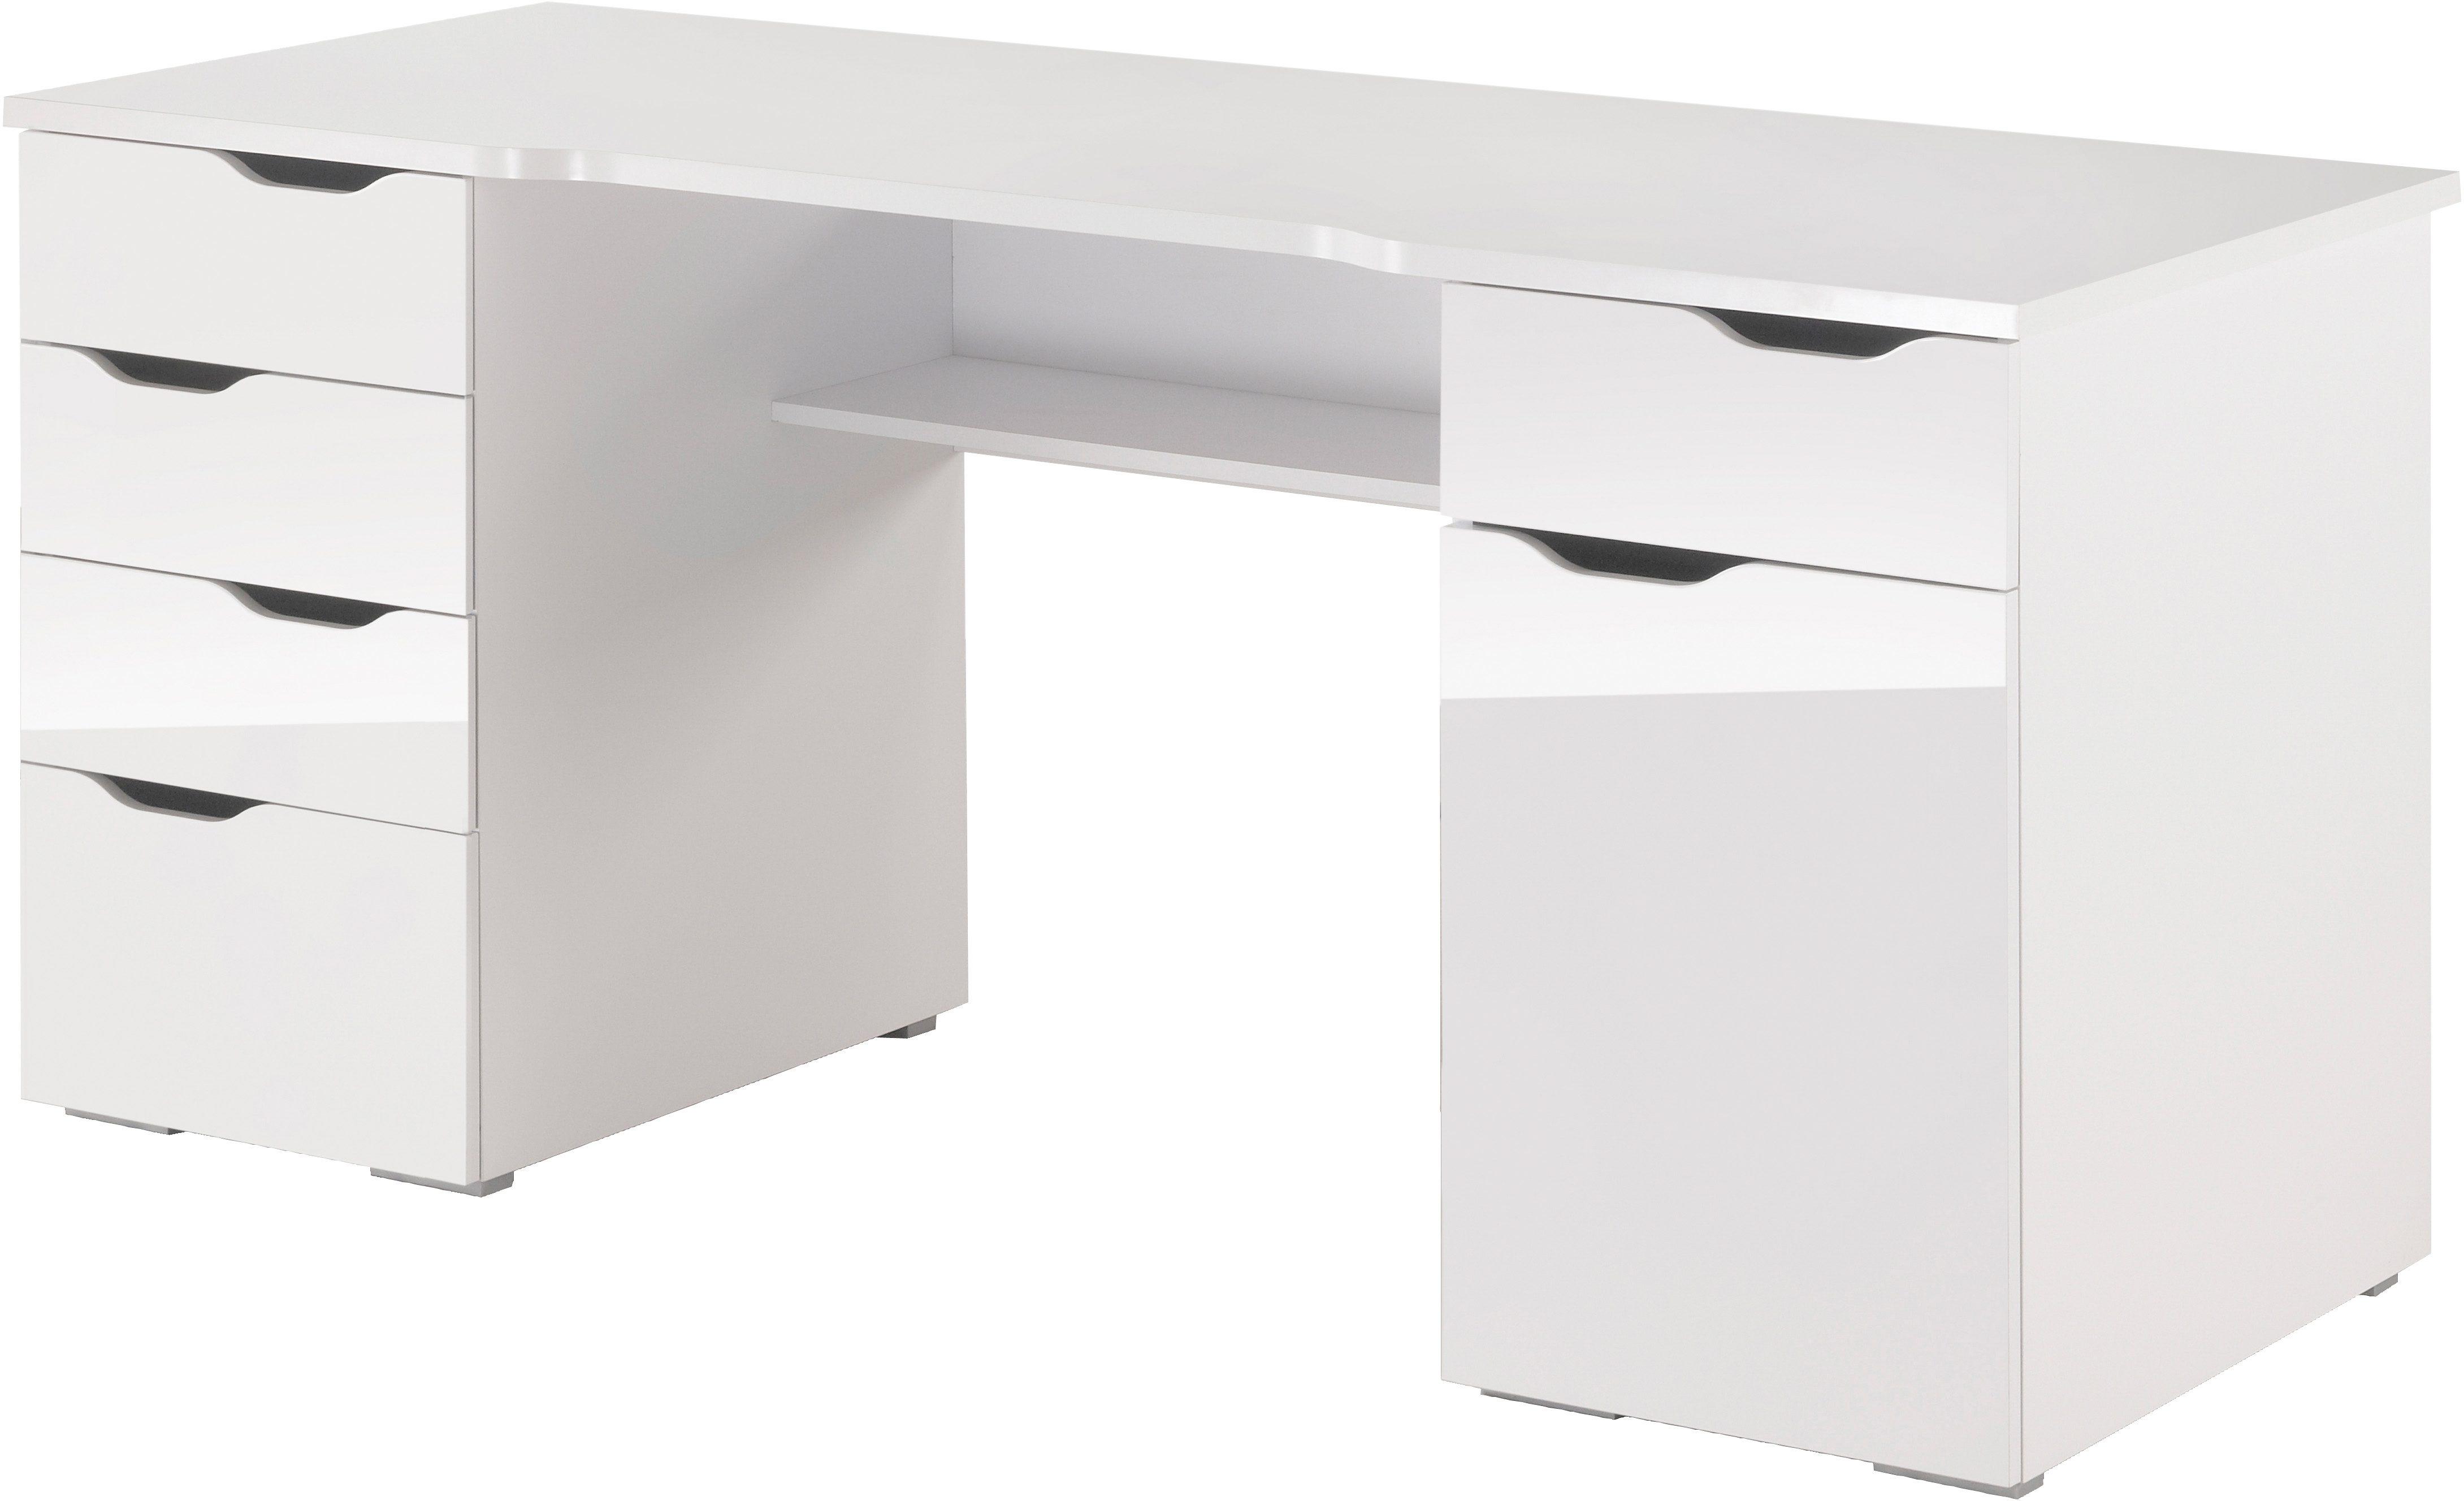 Schreibtisch Maja Möbel Cuba mit geschwungener Schreibtischplatte